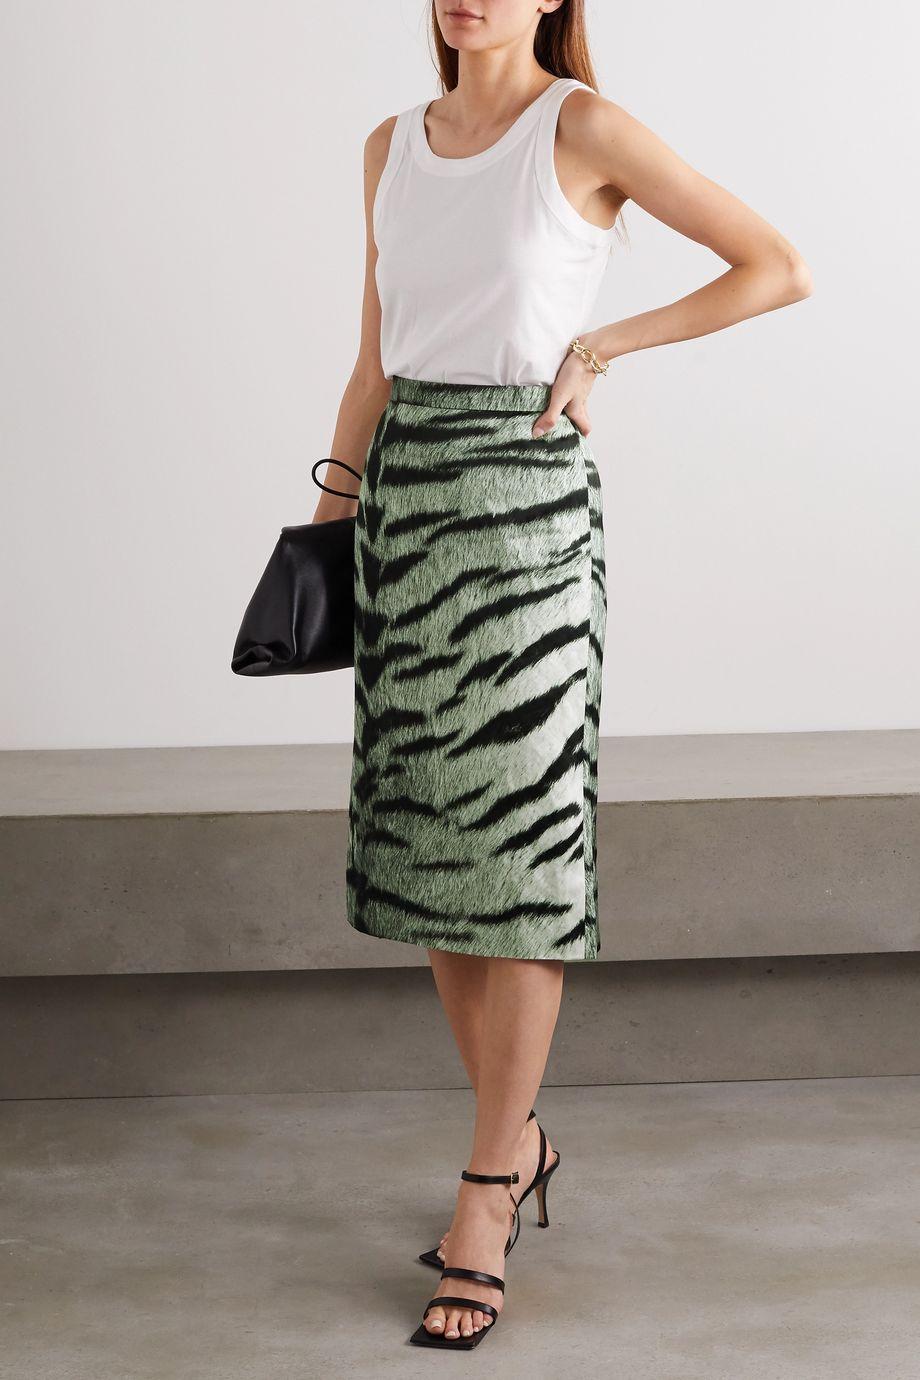 Dries Van Noten Zebra-print woven pencil skirt